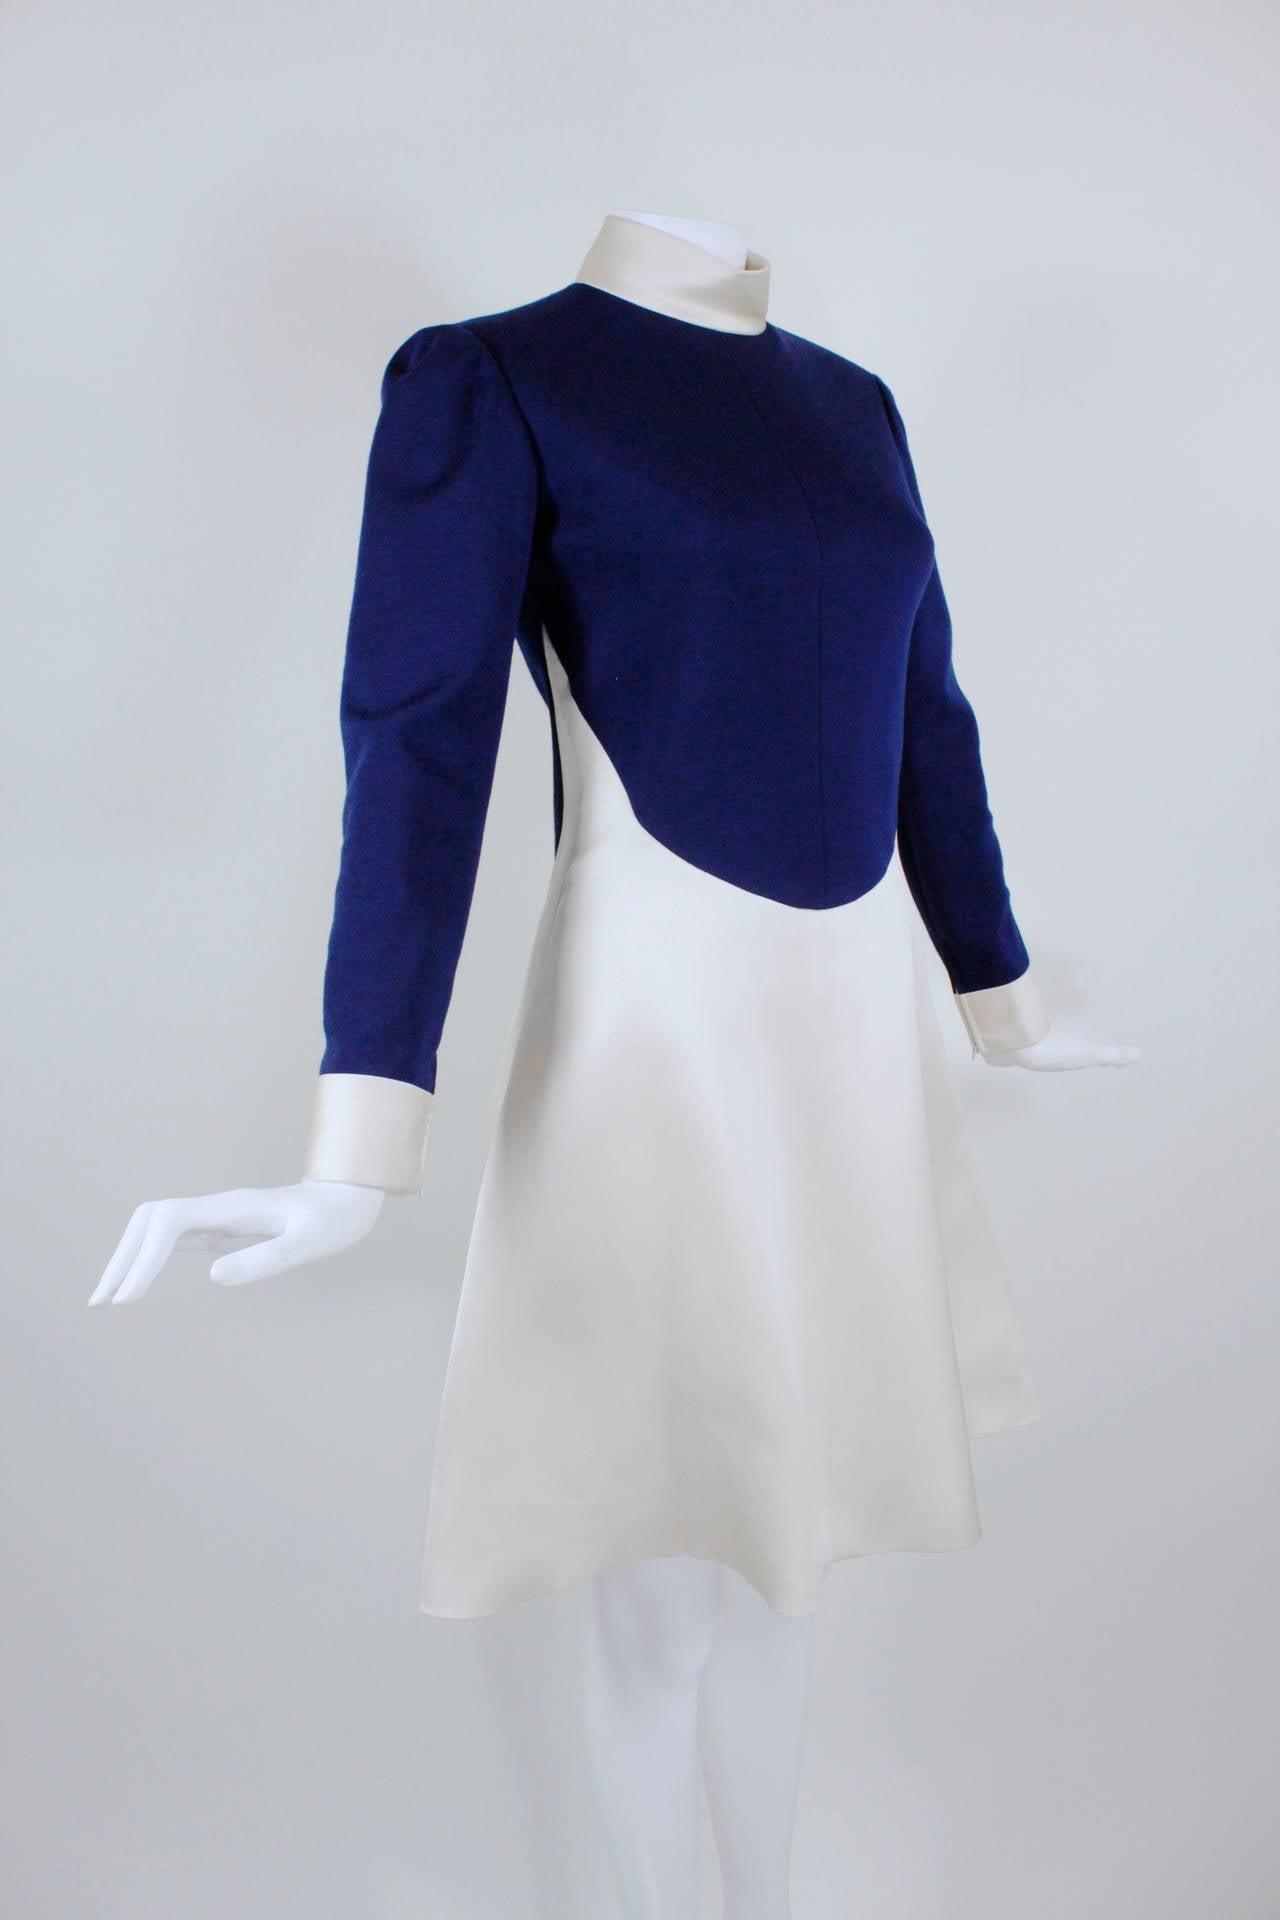 1960s Geoffrey Beene Navy Wool and Eggshell Mod Dress 5